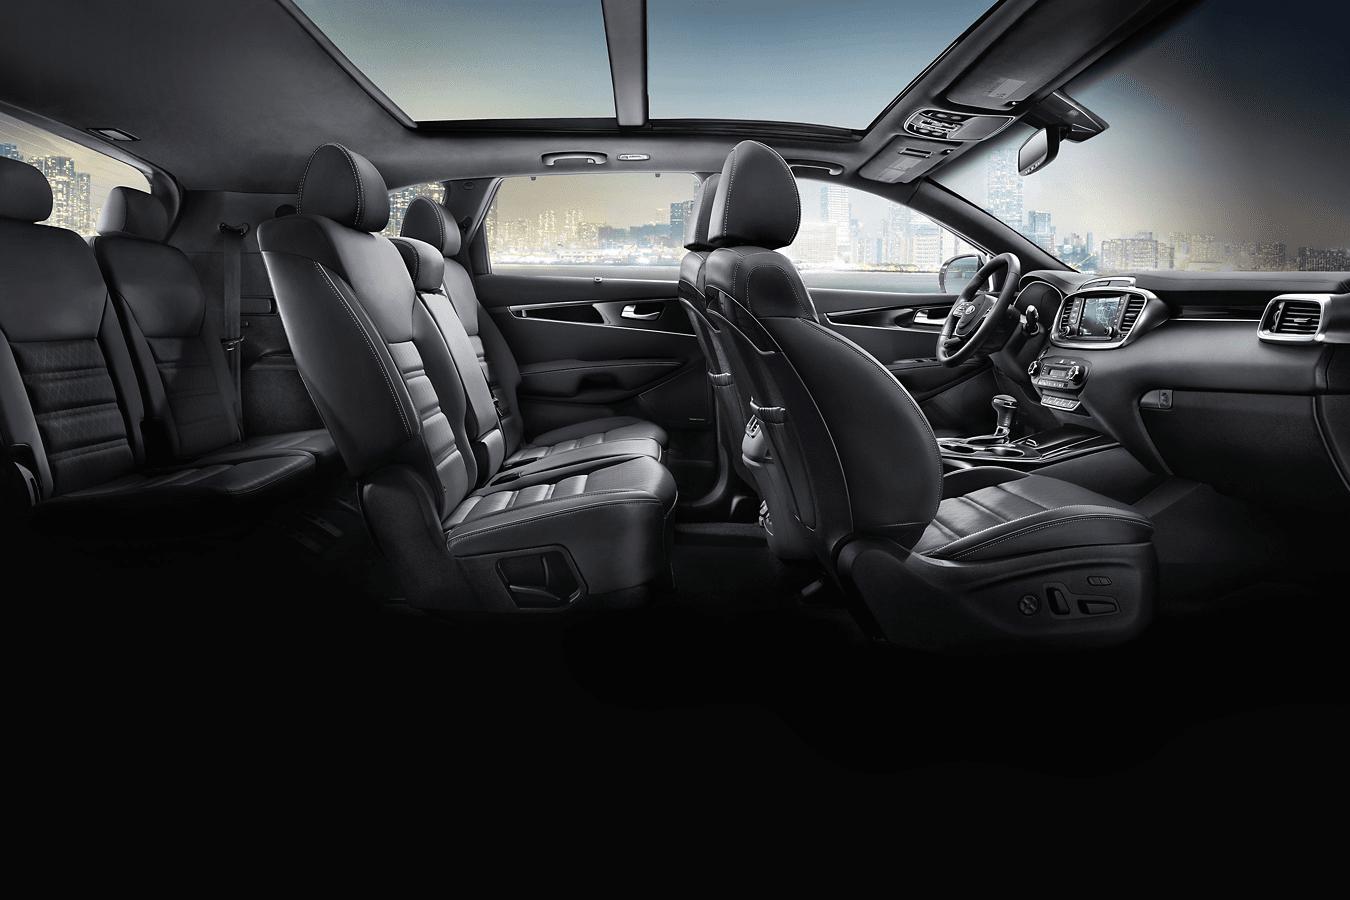 2019 Kia Sorento passenger volume interior